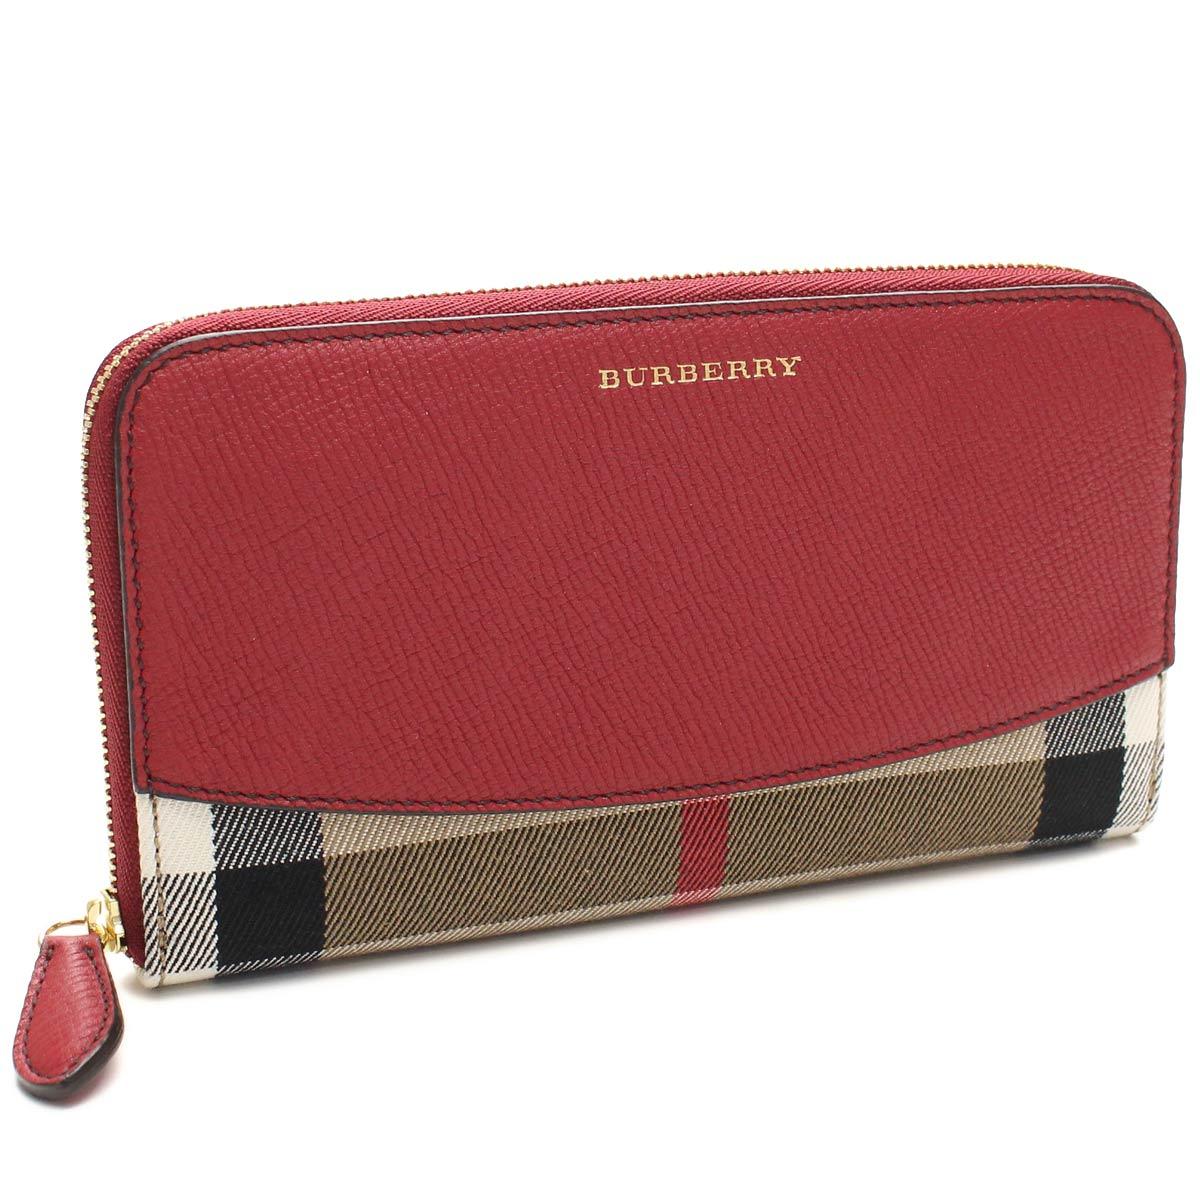 BURBERRY 3975333-RUSSET REDバーバリー ラウンドファスナー長財布キャンバス×レザーレッド系マルチカラー×ゴールド